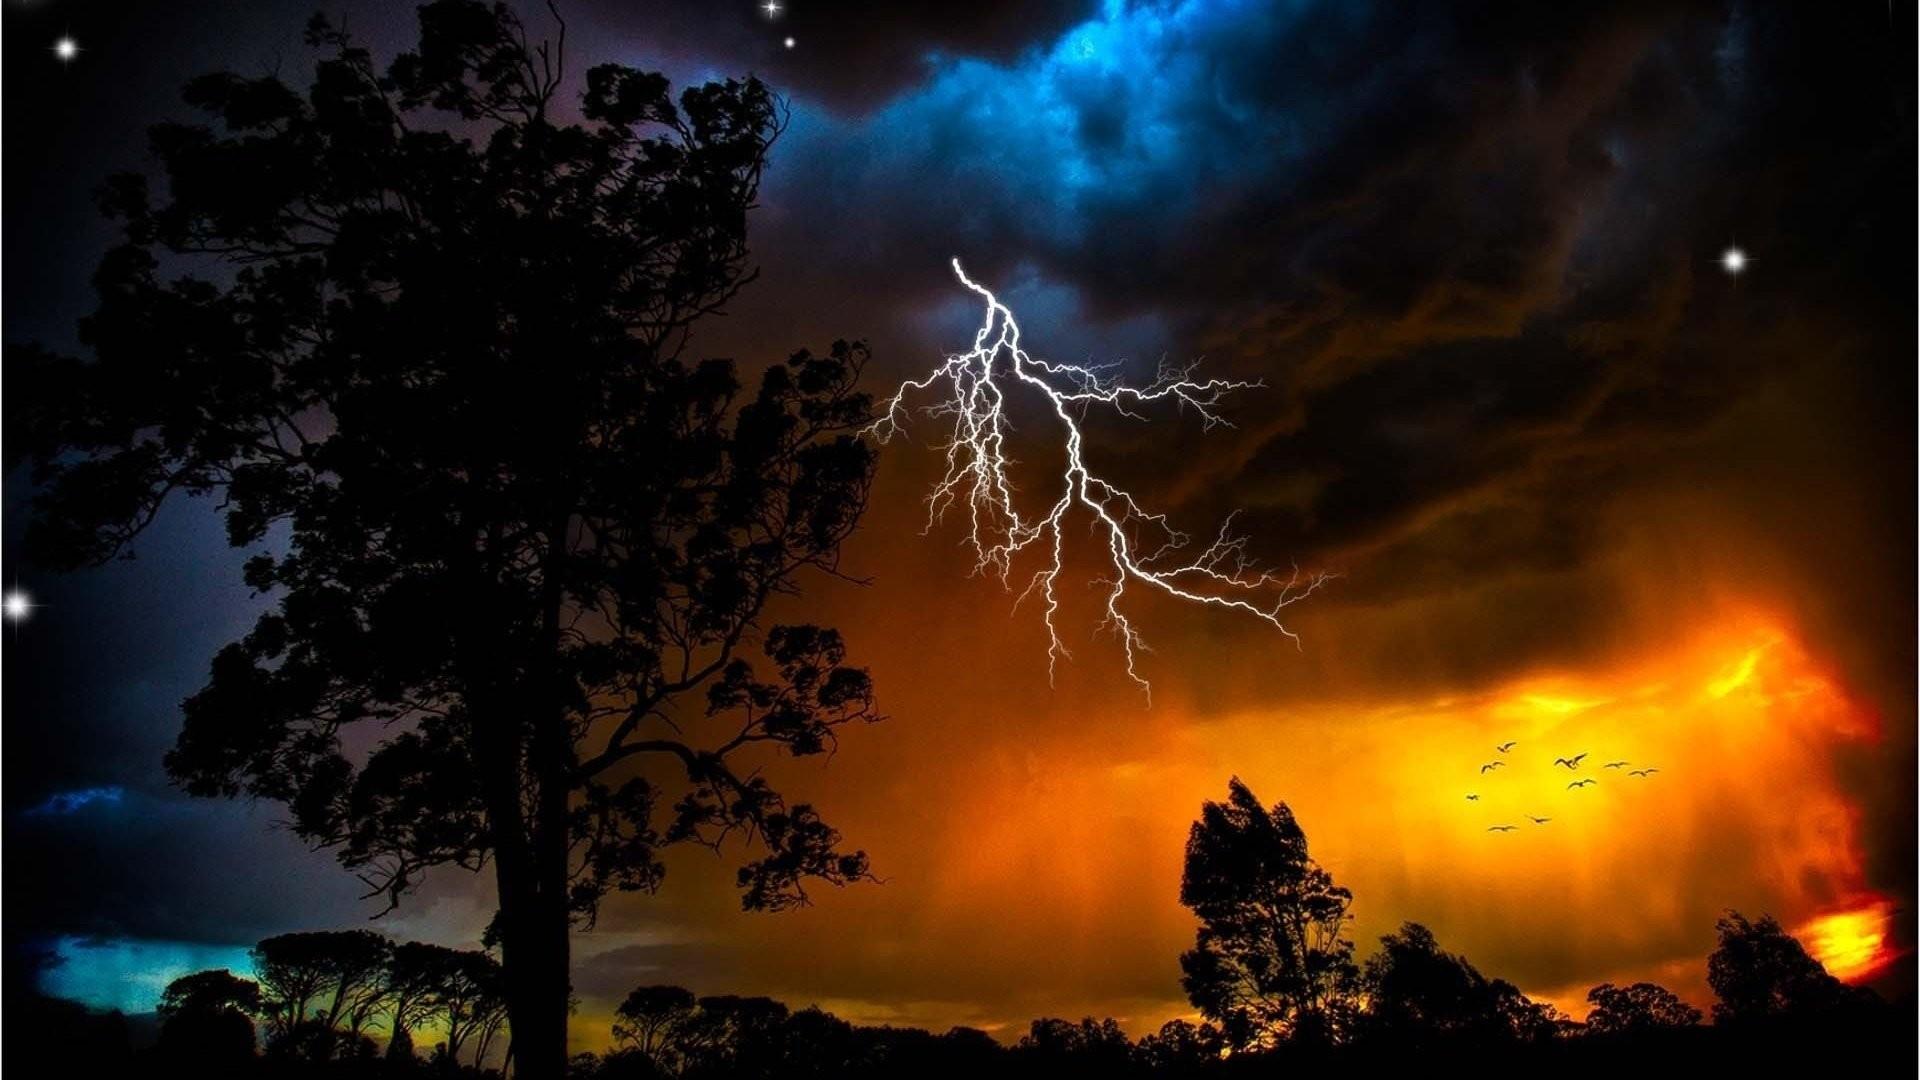 Lightning Wallpaper Hd Iphone